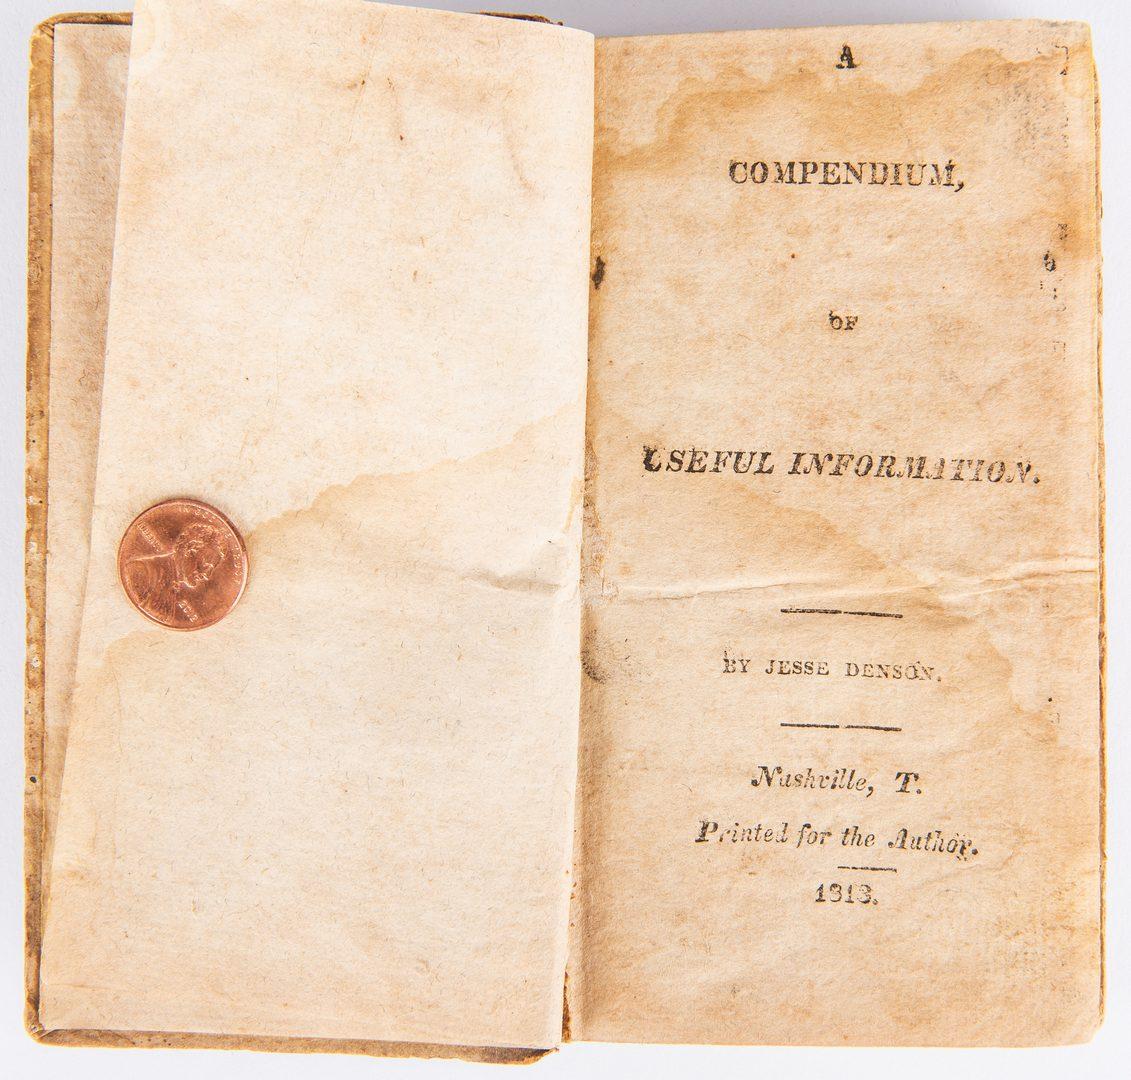 Lot 256: Denson, Compendium Nashville Imprint, 1813